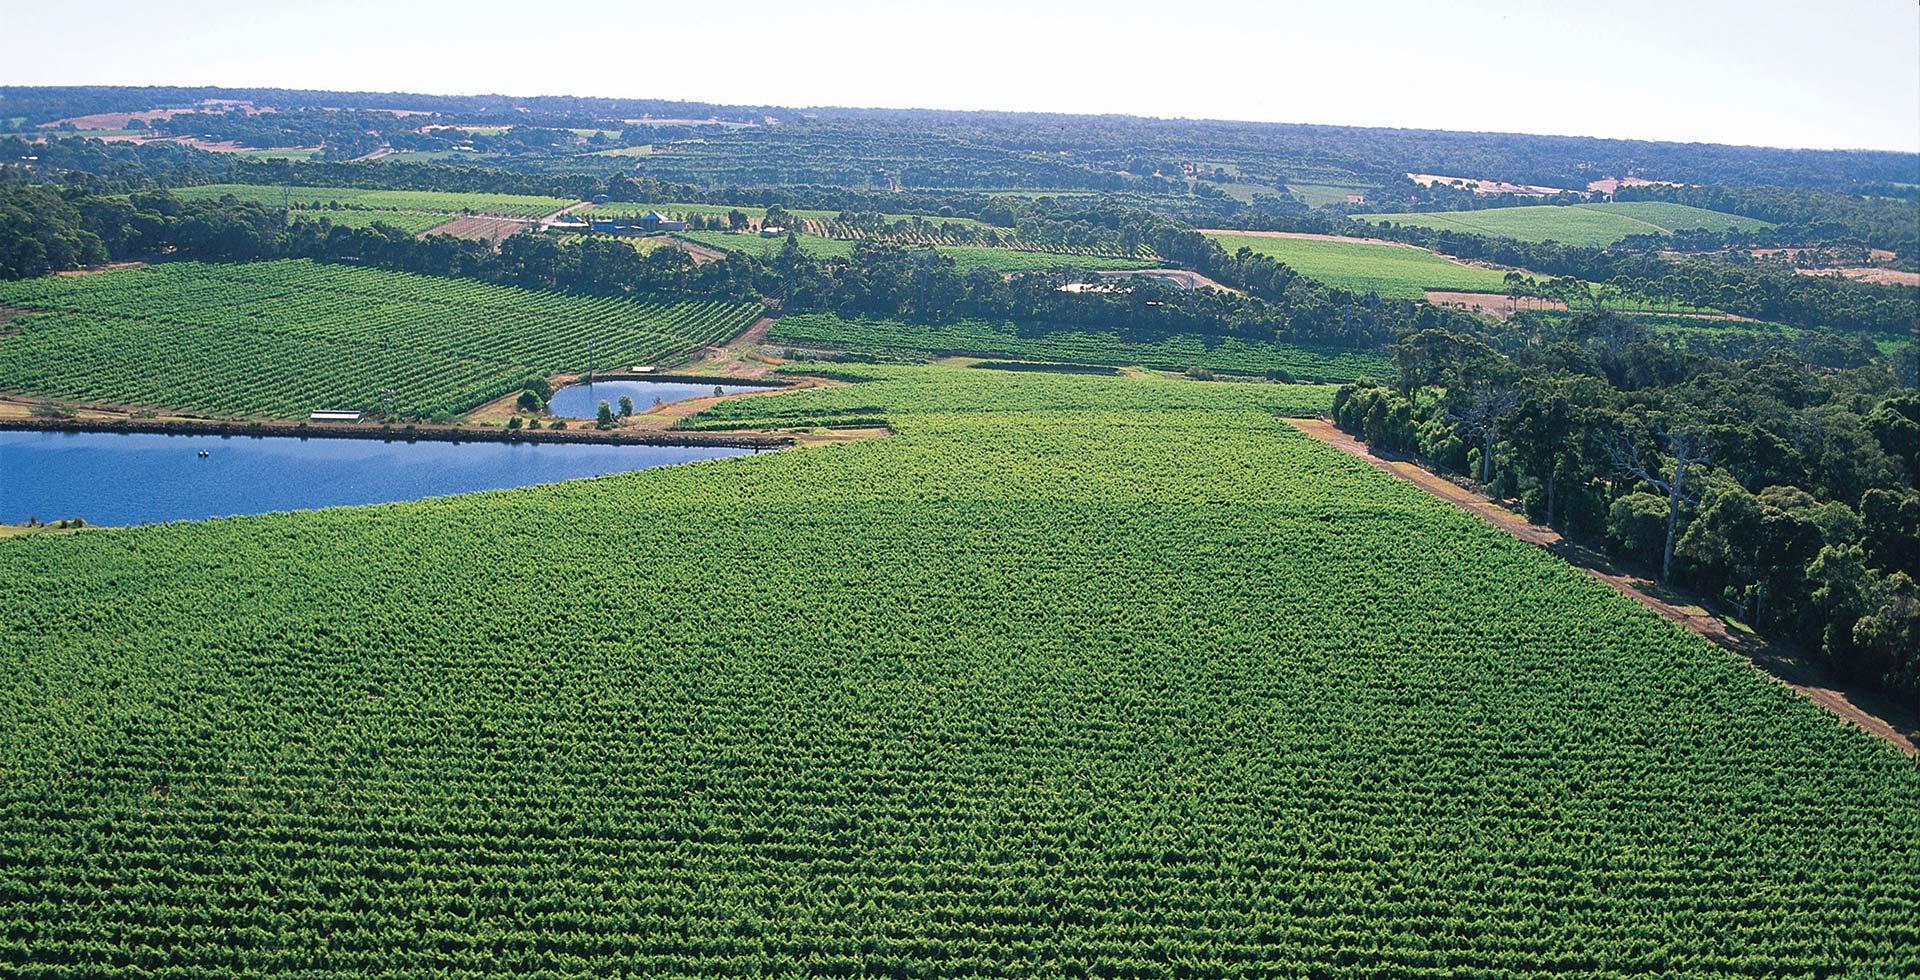 Visit world-class vineyards throughout Margaret River